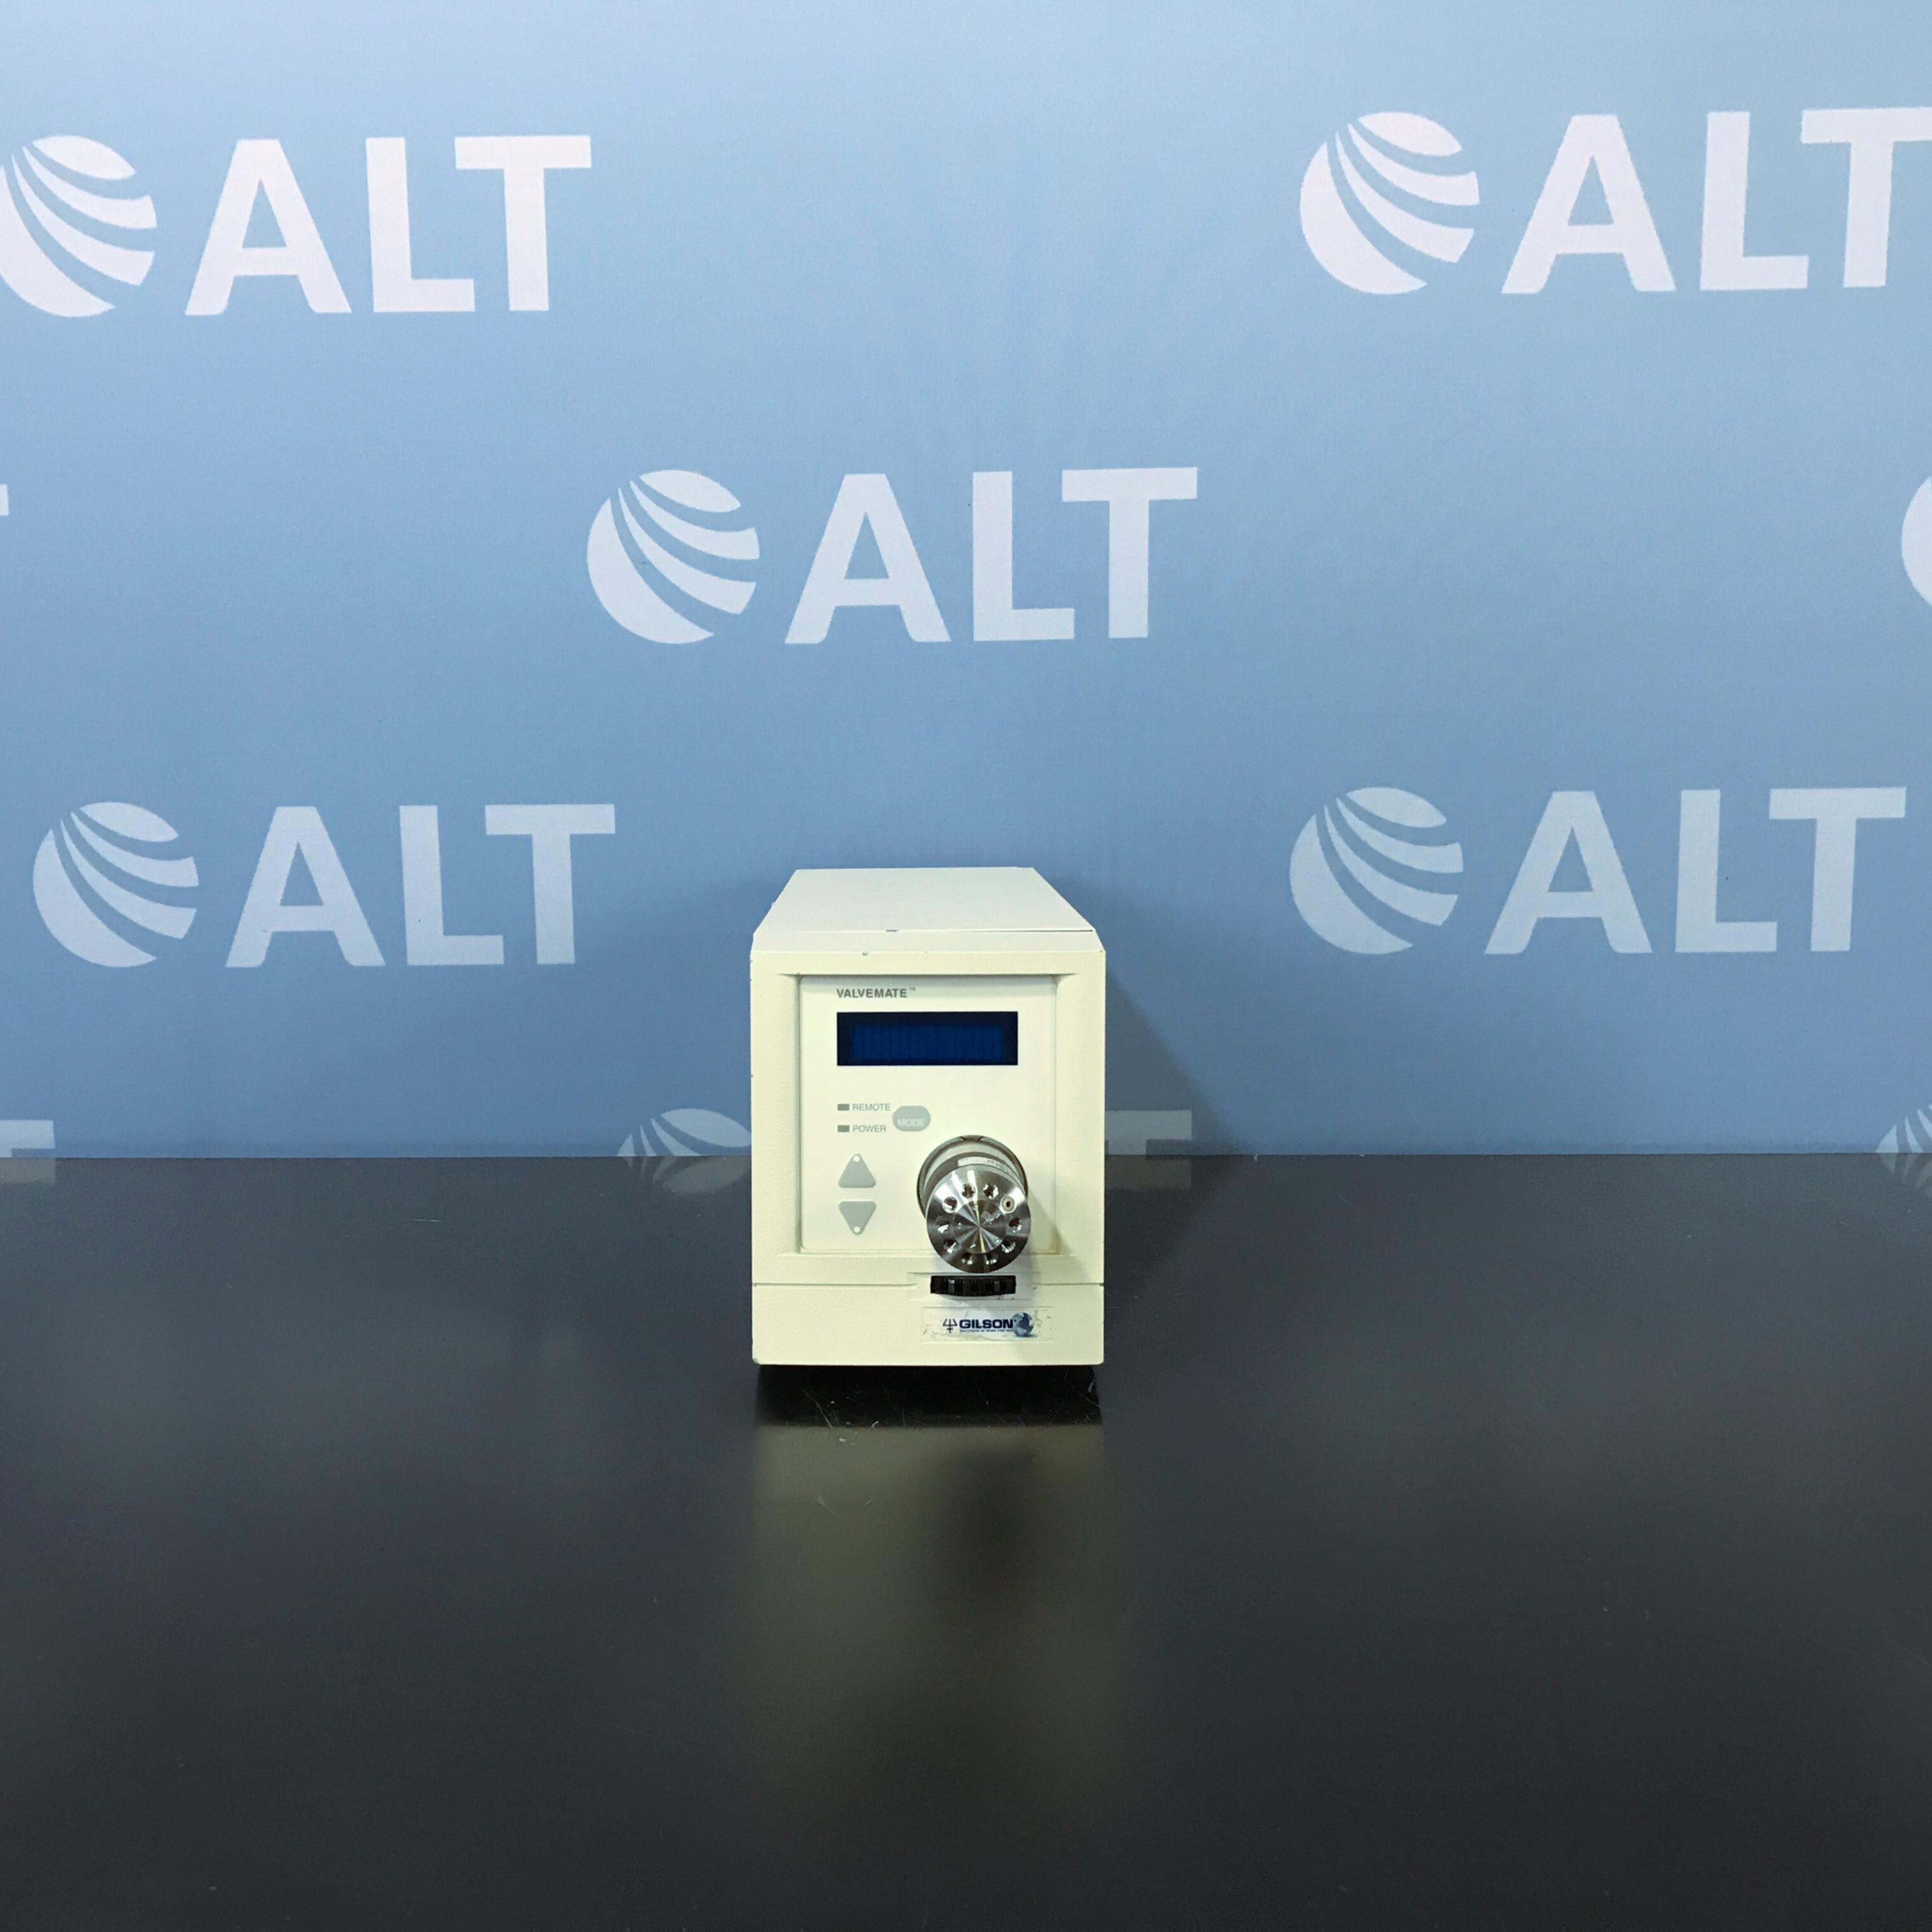 Gilson Valvemate Valve Actuator Image